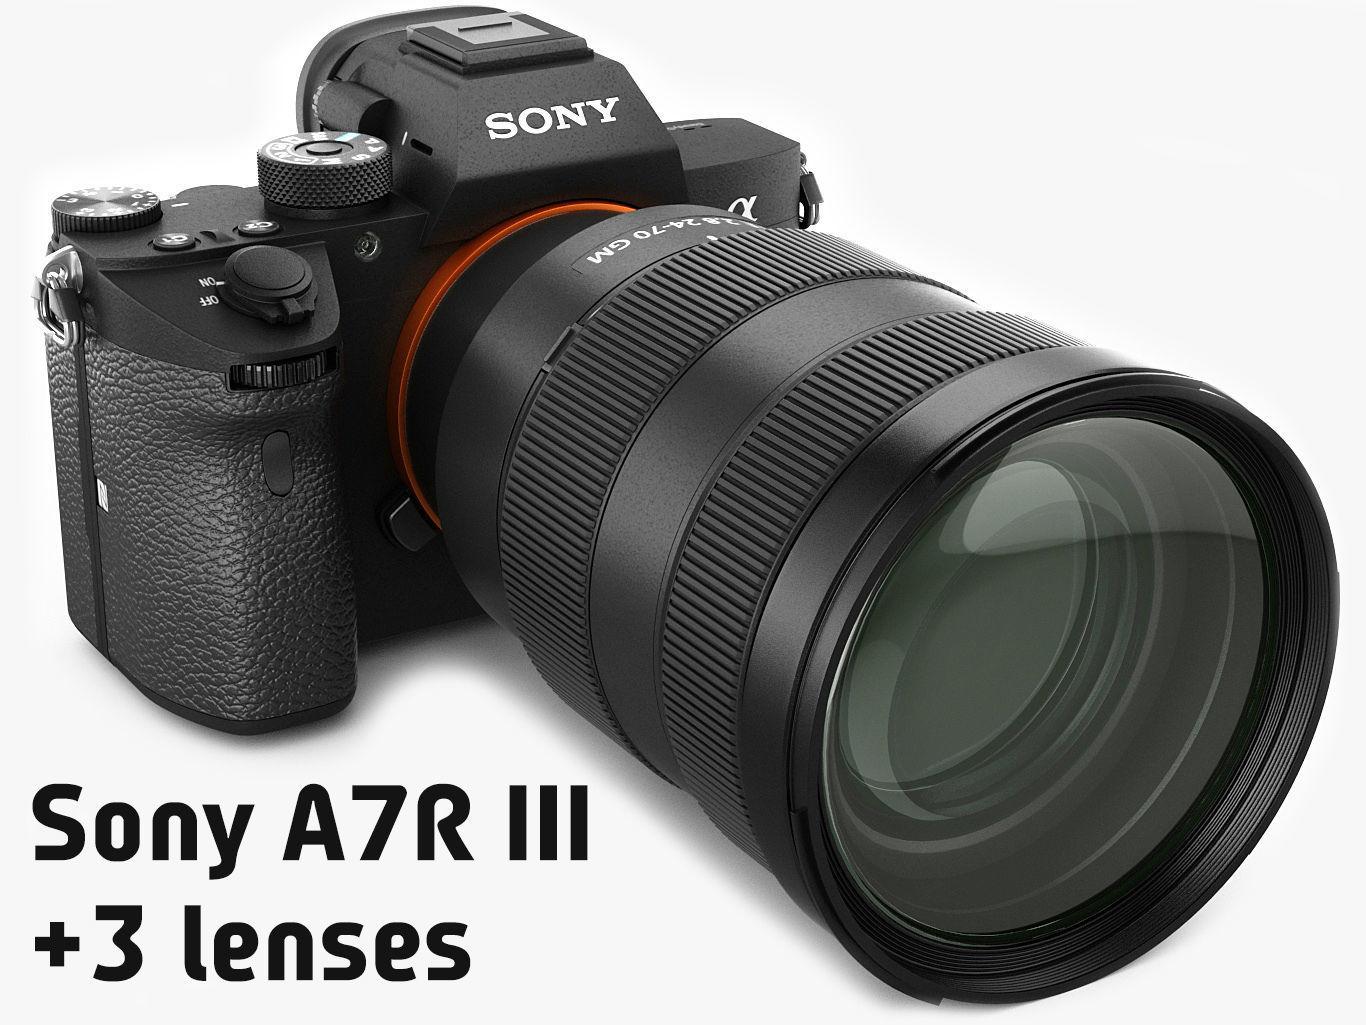 Sony Alpha 7R III with three lenses